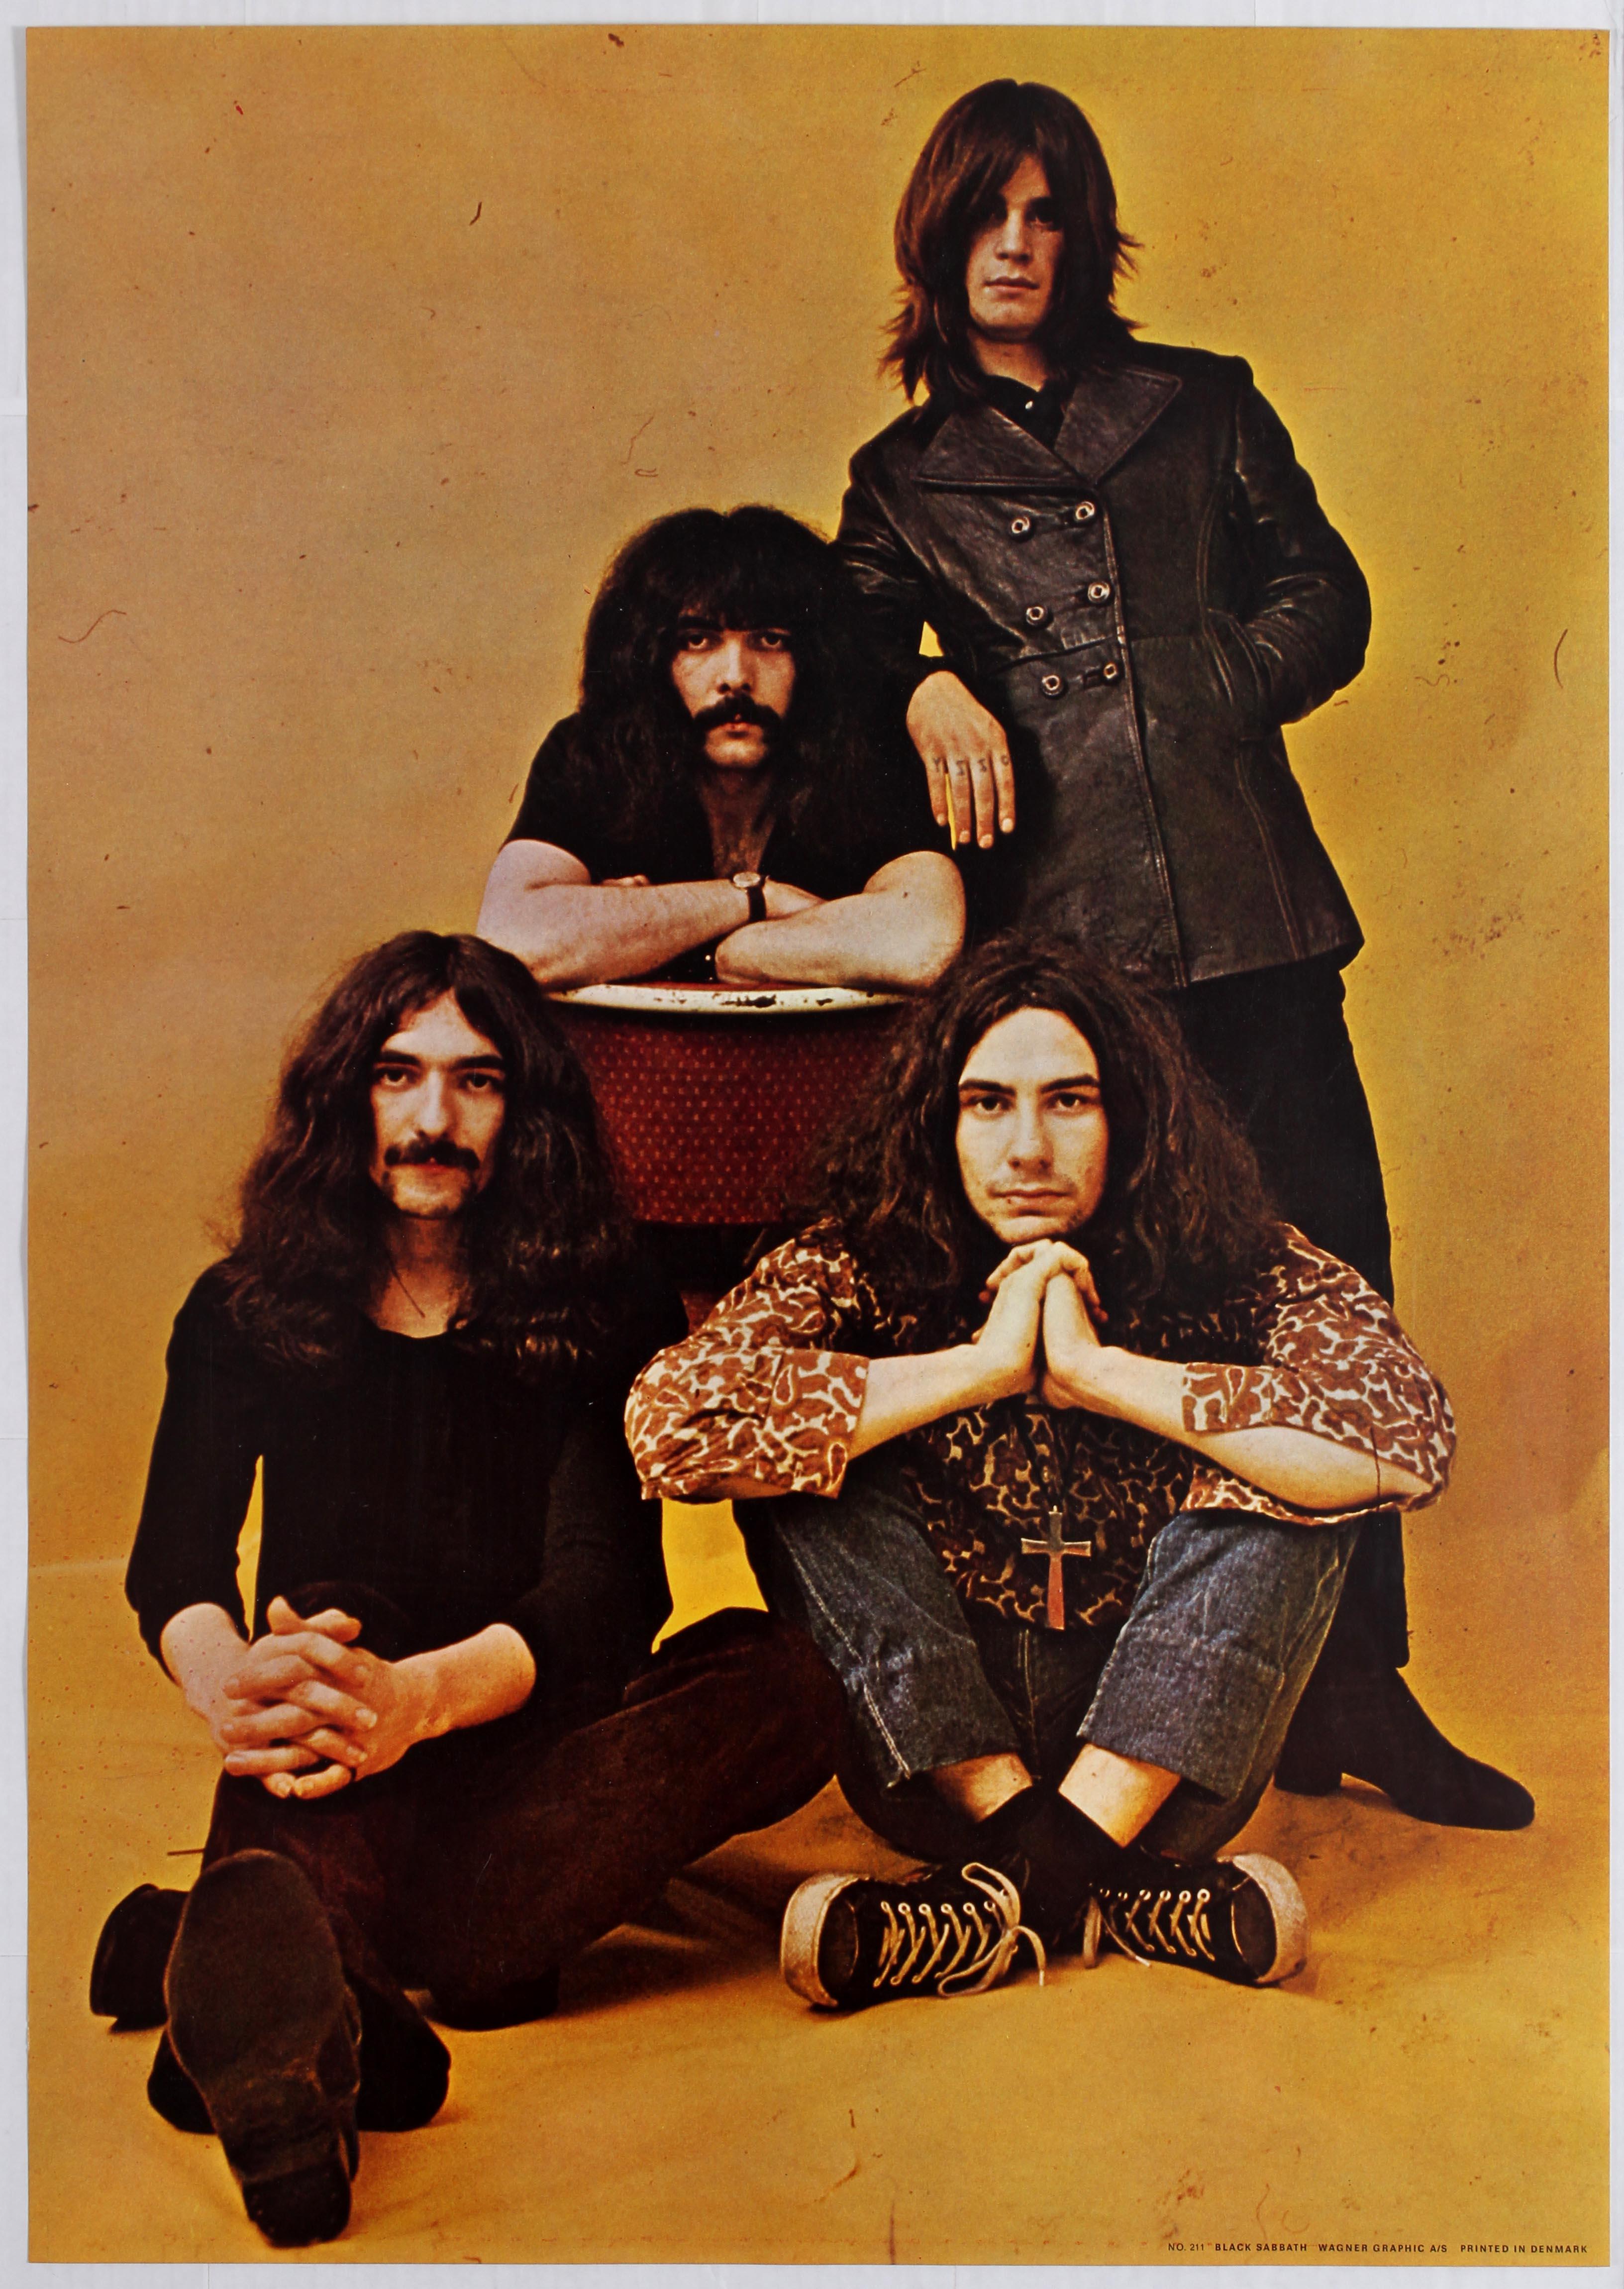 Lot 1705 - Advertising Poster Black Sabbath